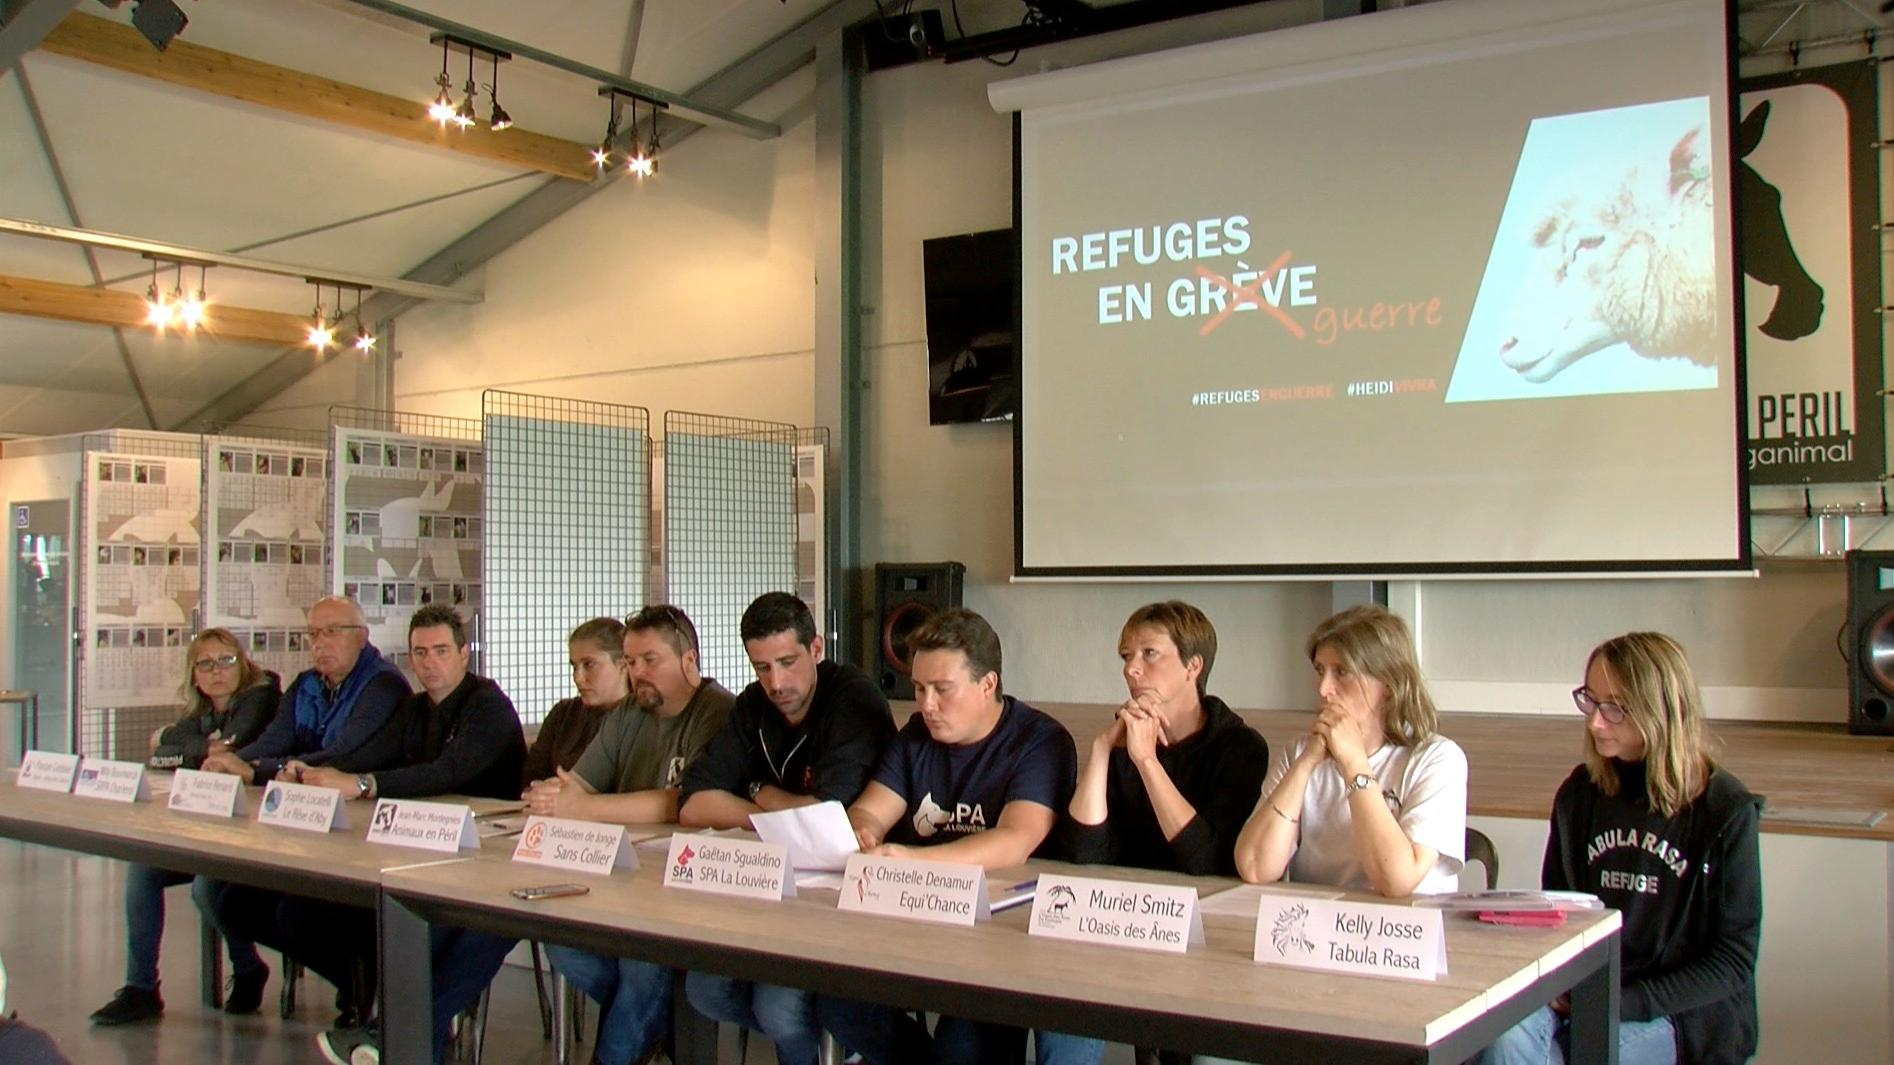 Rencontre avec Di Antonio : Les refuges satisfaits mais vigilants